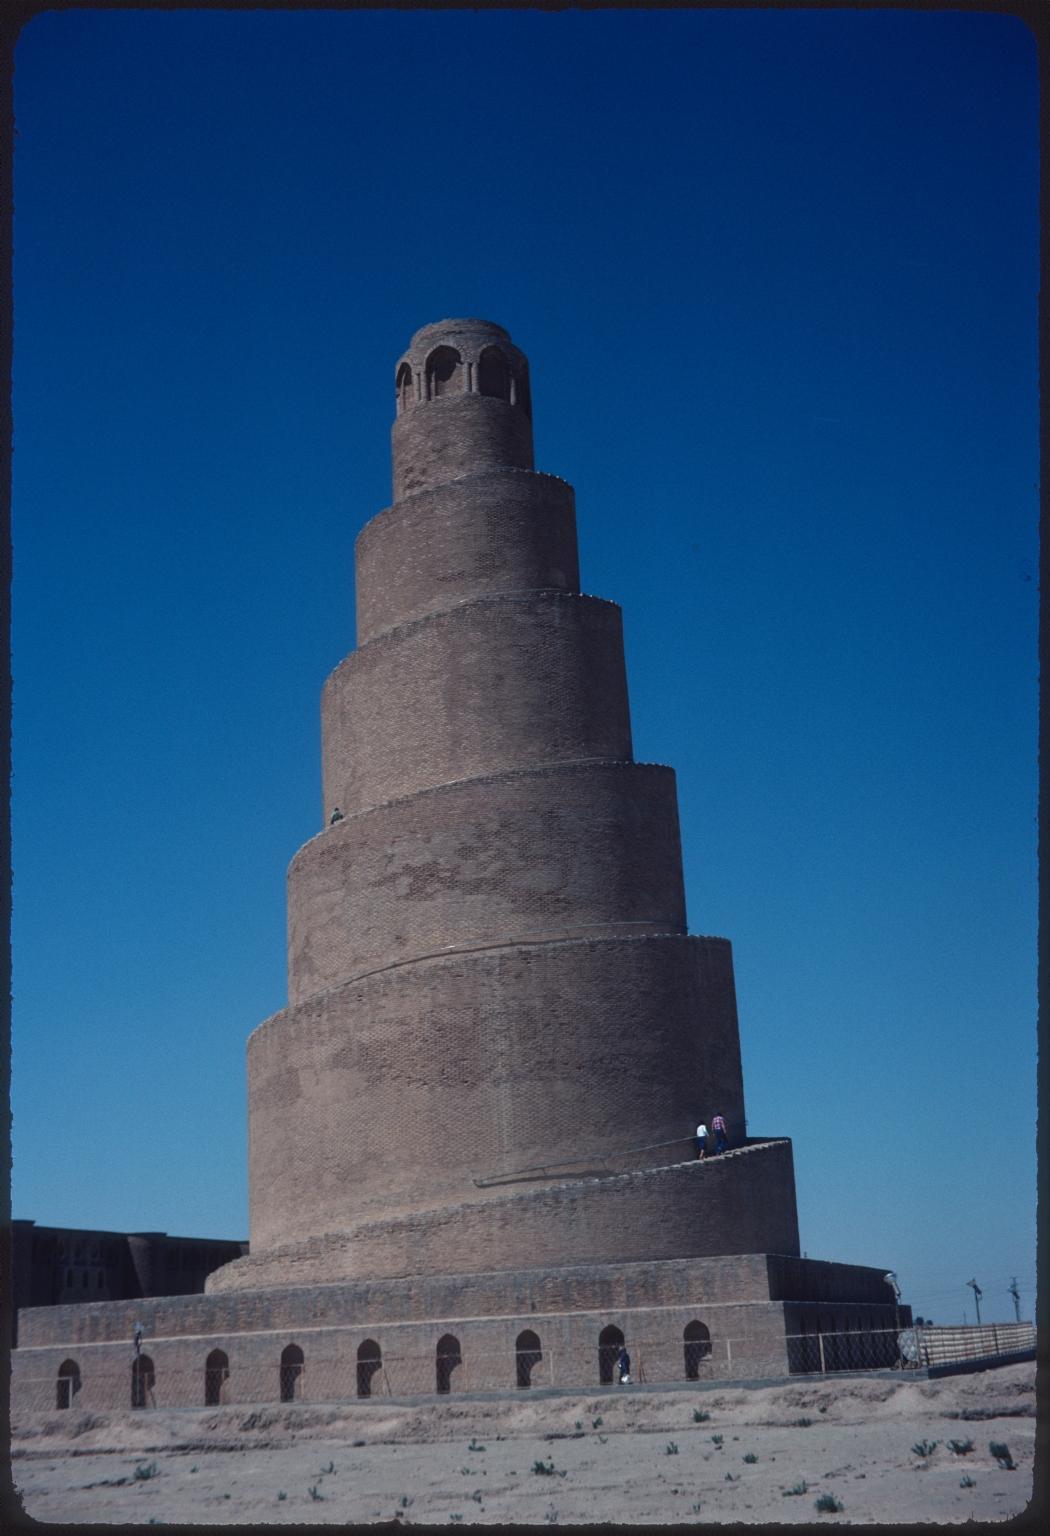 Malwiya Minarat